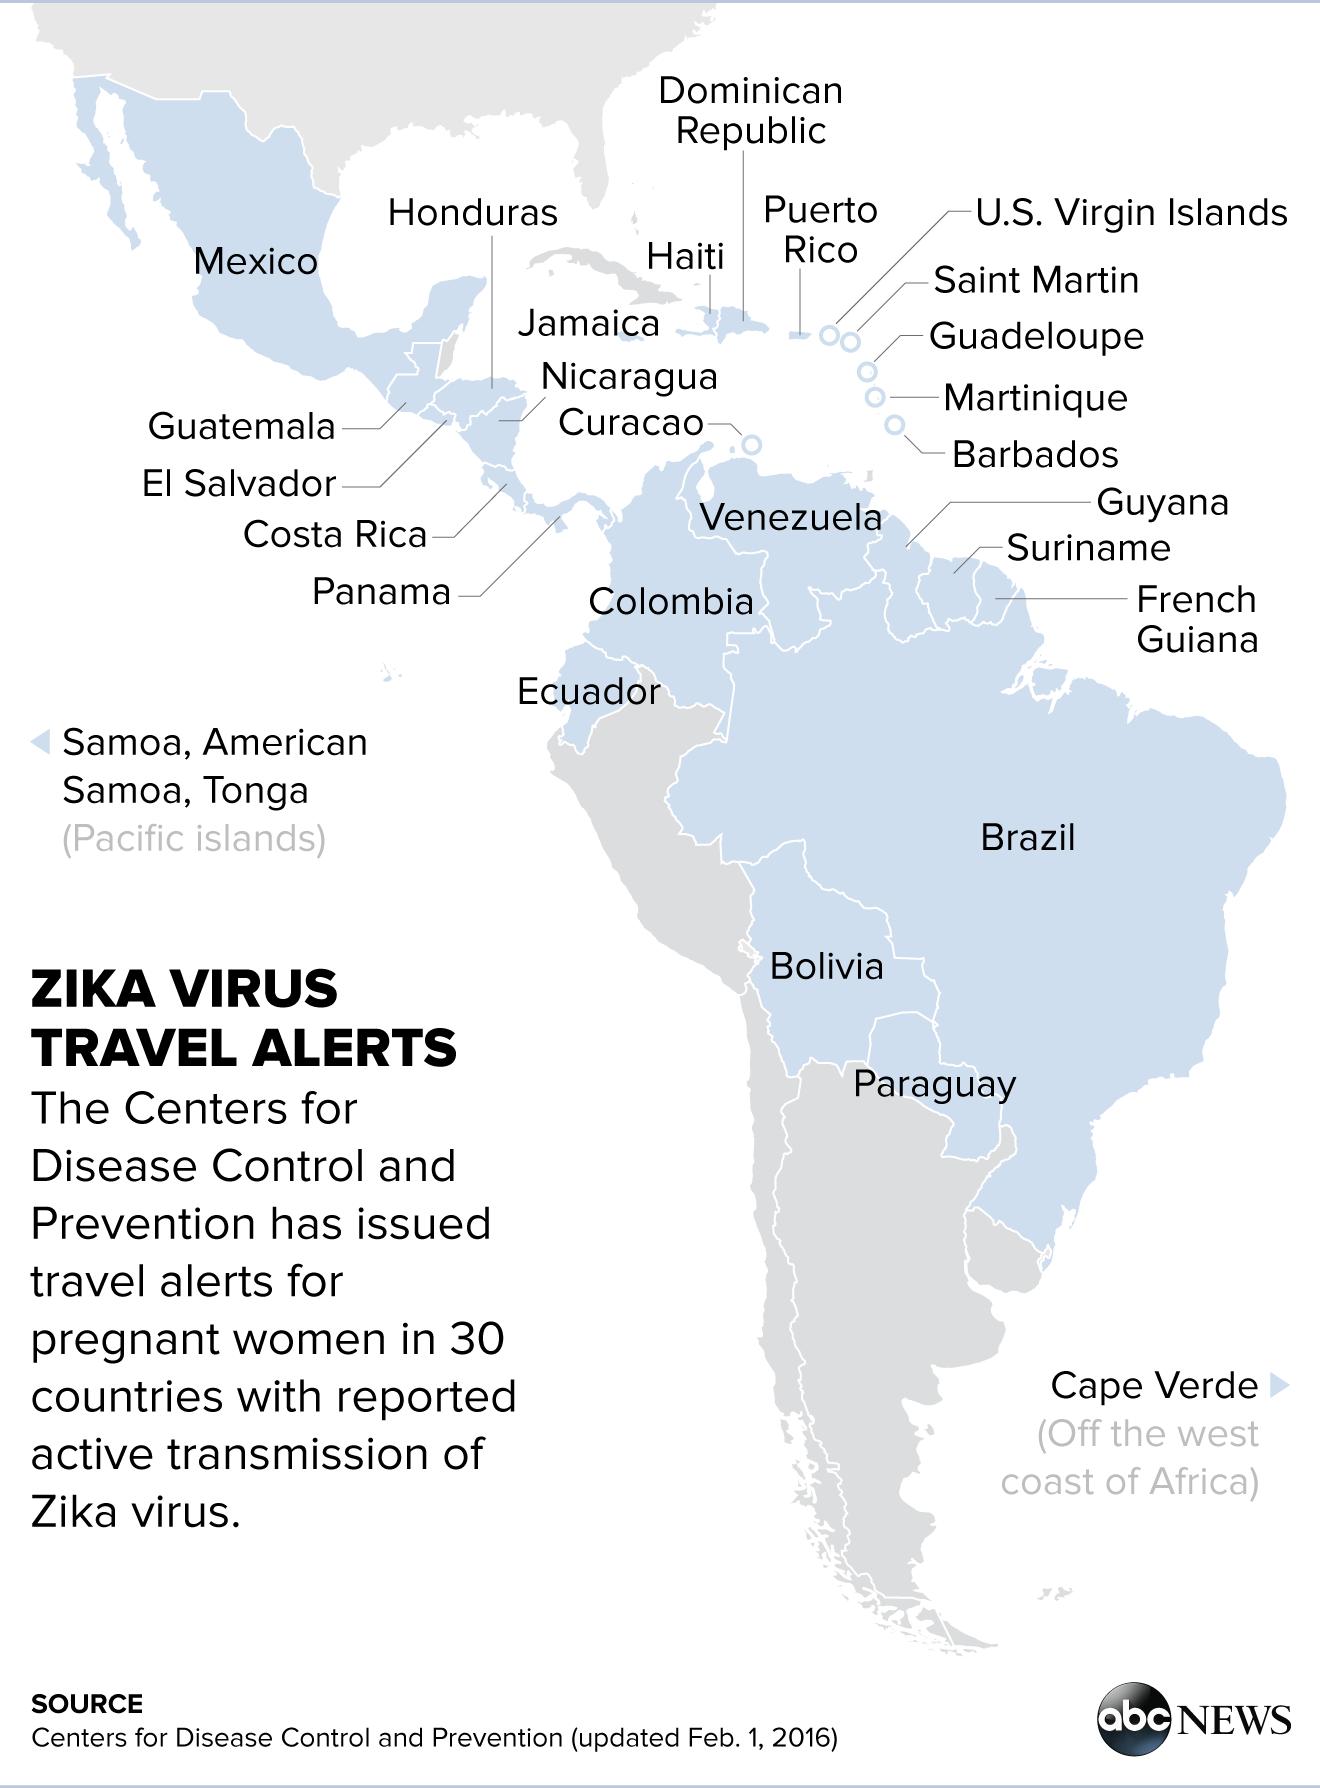 Zika Virus Outbreak Updates China Reports First Case ABC News - Us zika map